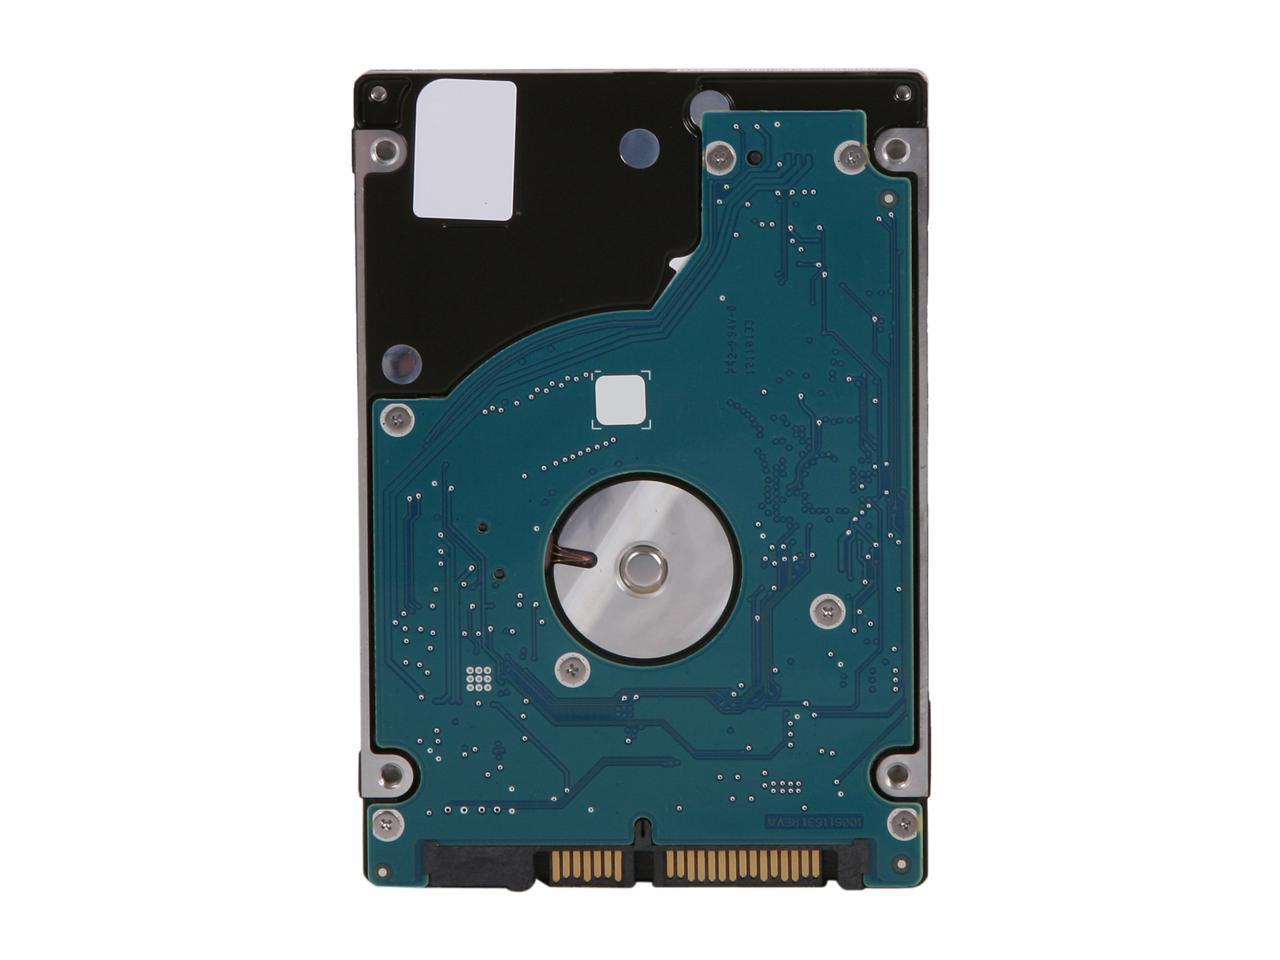 Seagate Momentus Thin ST320LT009 320GB 7200 RPM 16MB Cache